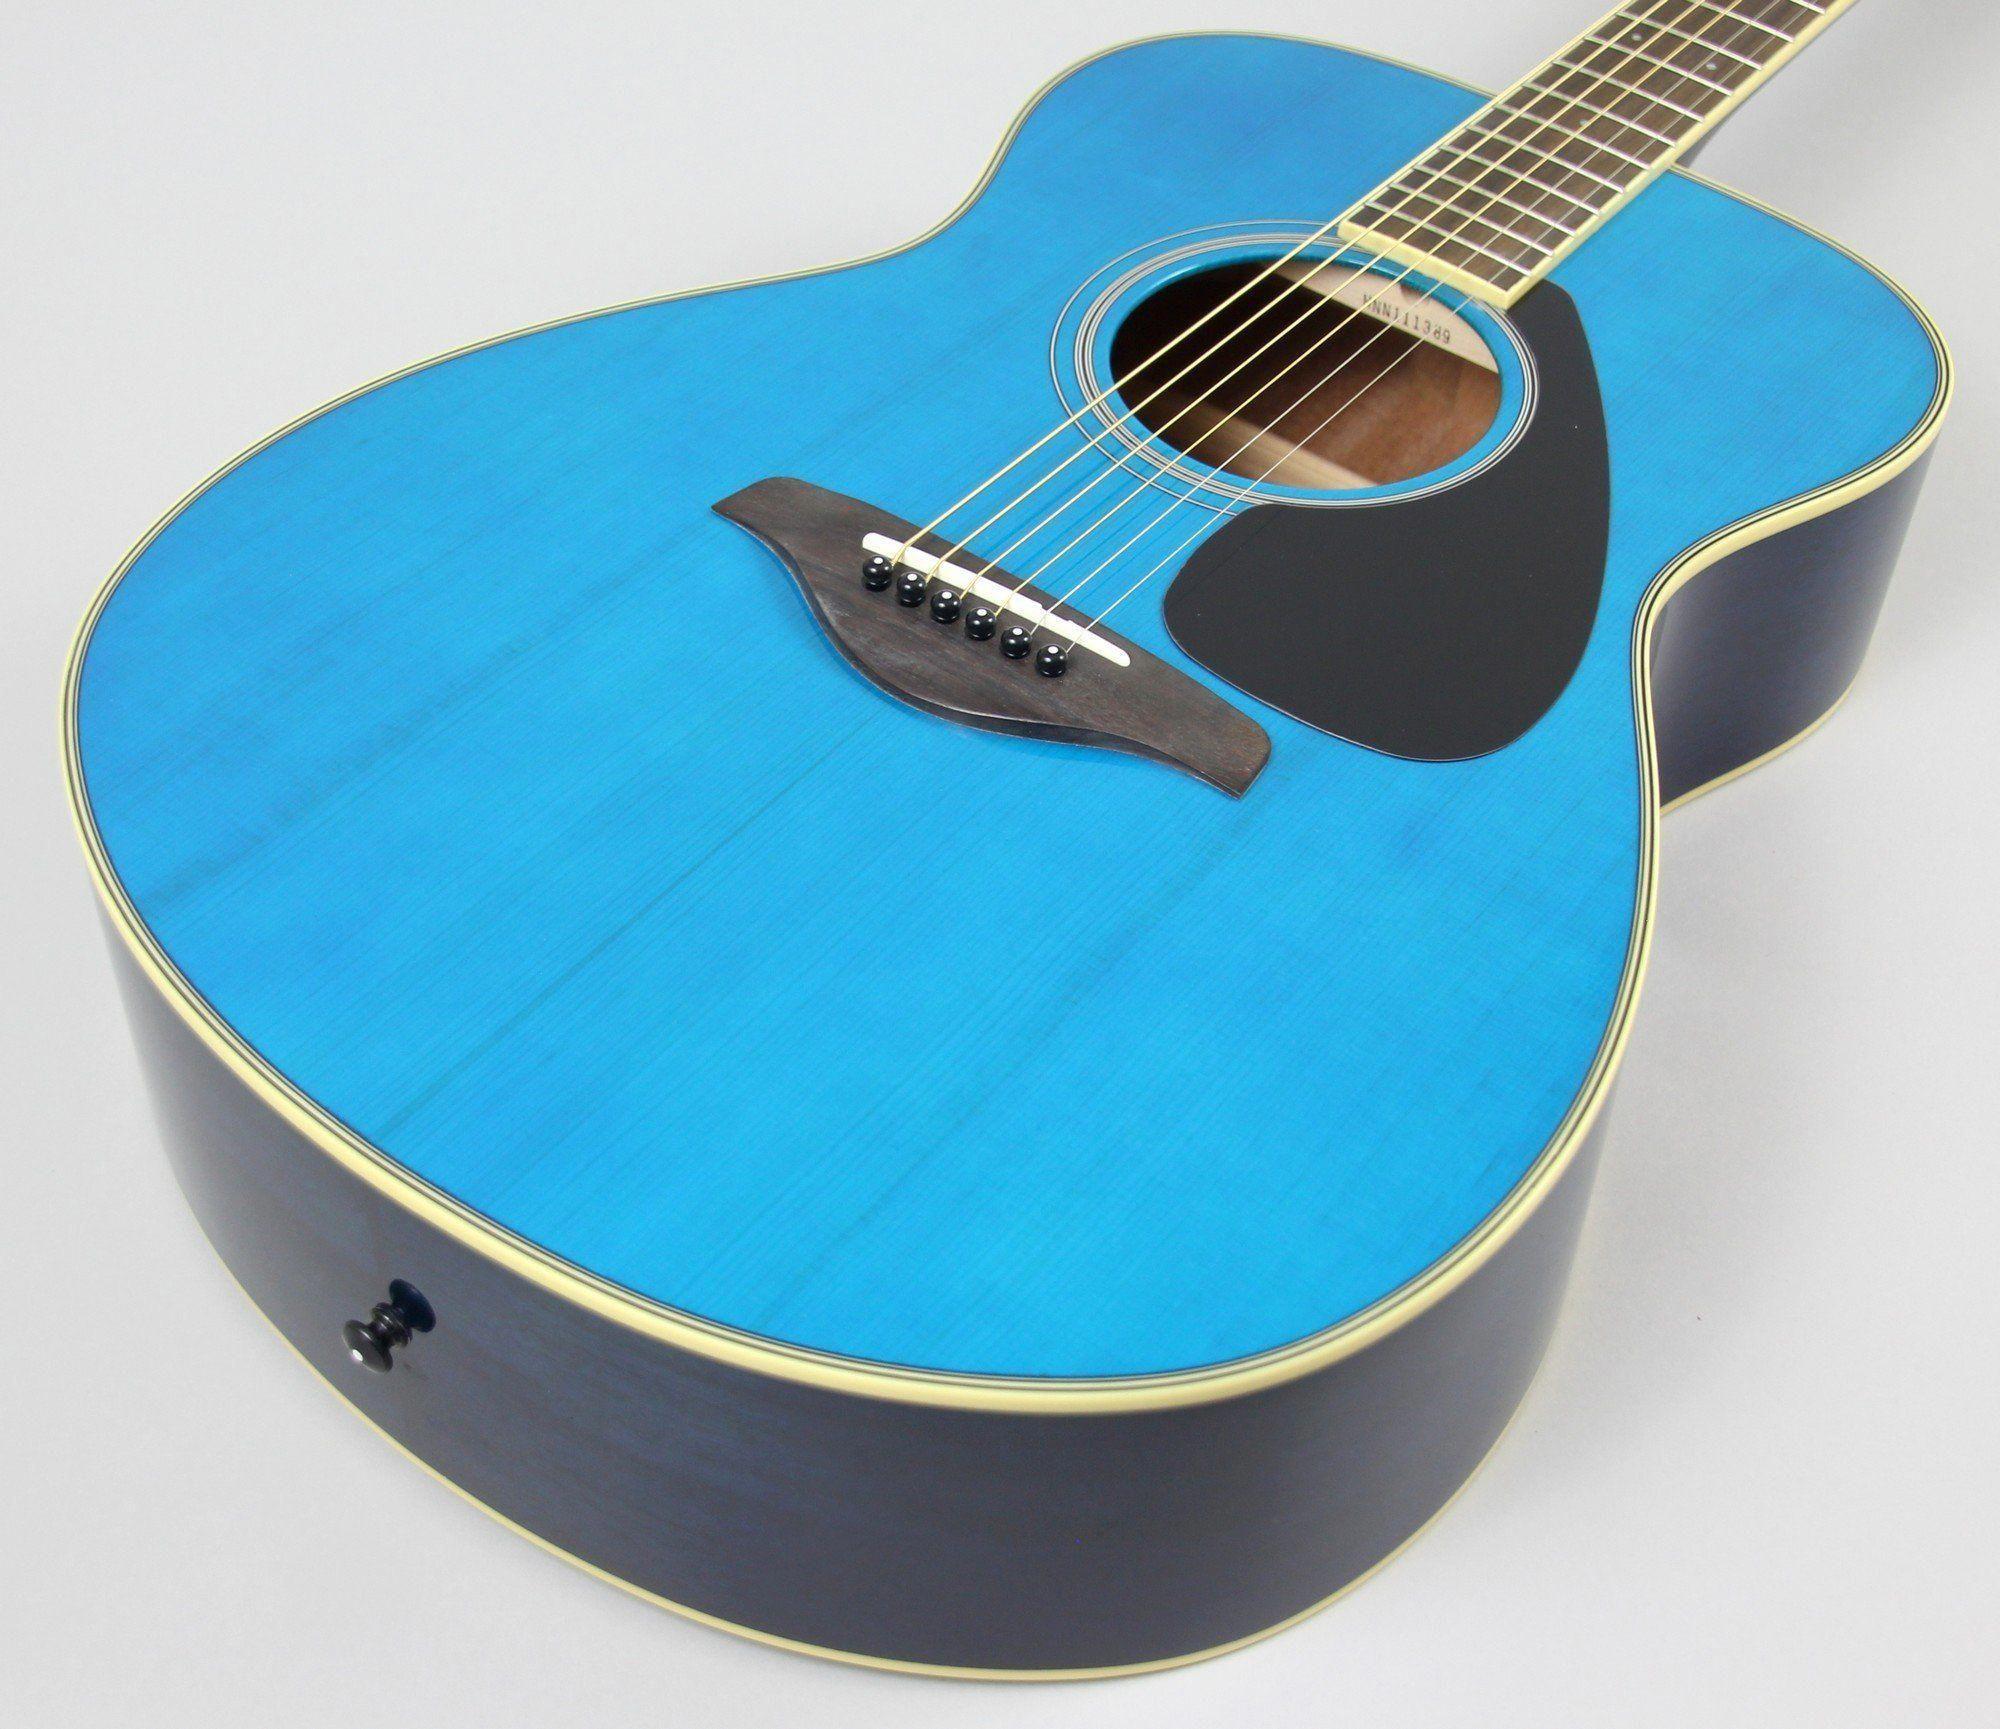 Acoustic Guitar Notes 0445 Acousticguitarnotes Yamaha Guitar Acoustic Guitar Notes Guitar